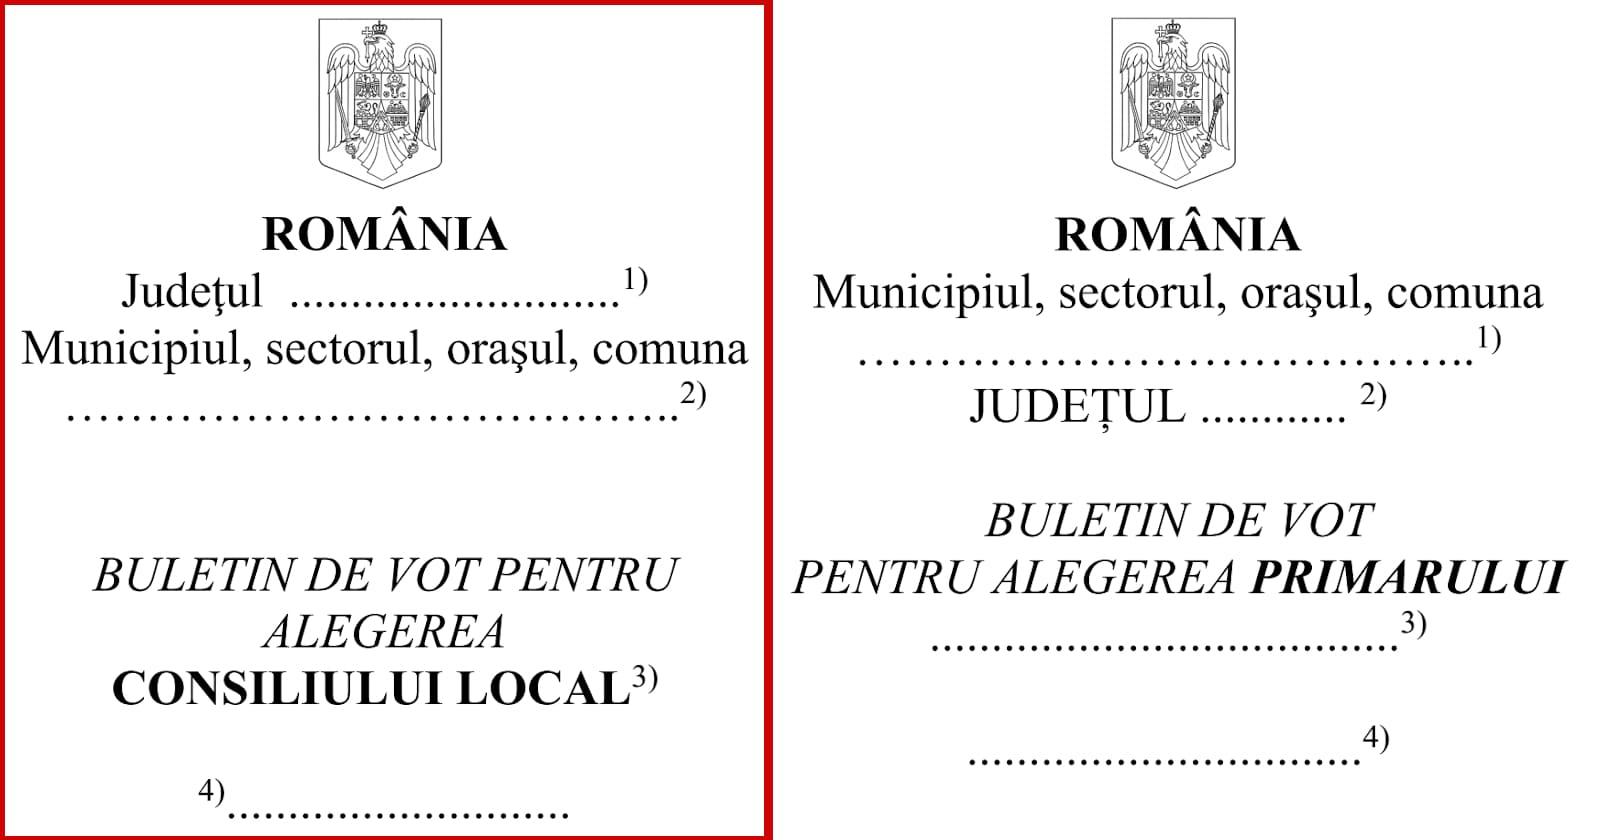 https://ziarul.romania-rationala.ro/control/articole/articole/buletin-de-vot-locale-2020.jpg